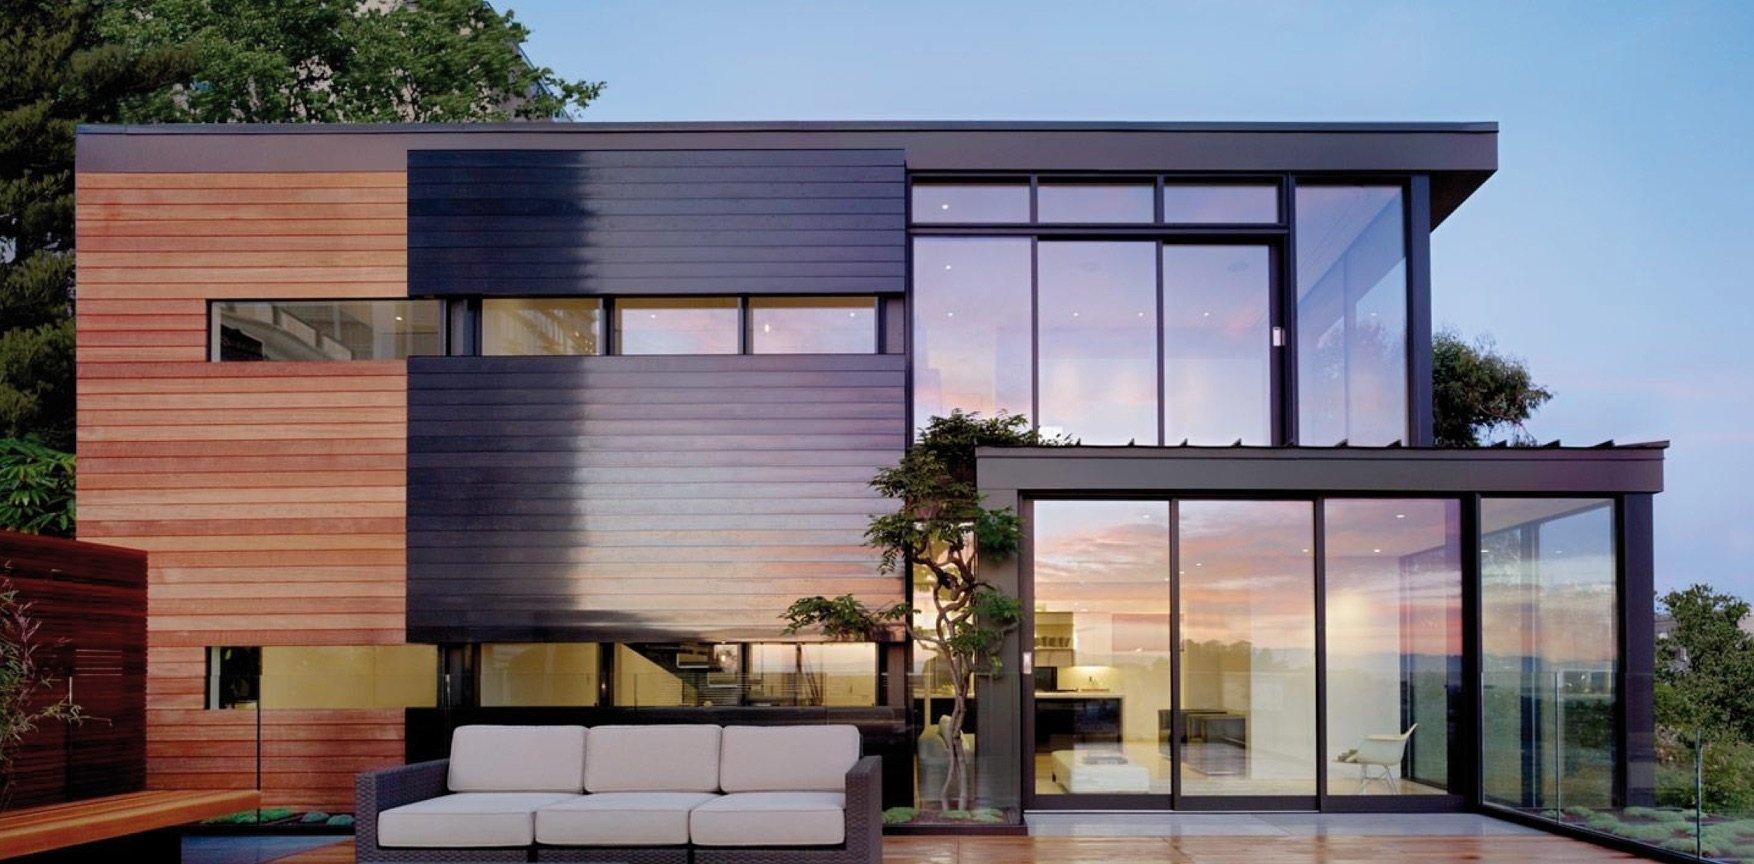 Resysta-Haus-Sofa-Baum-Holz-Fassade-Villa-Landhaus